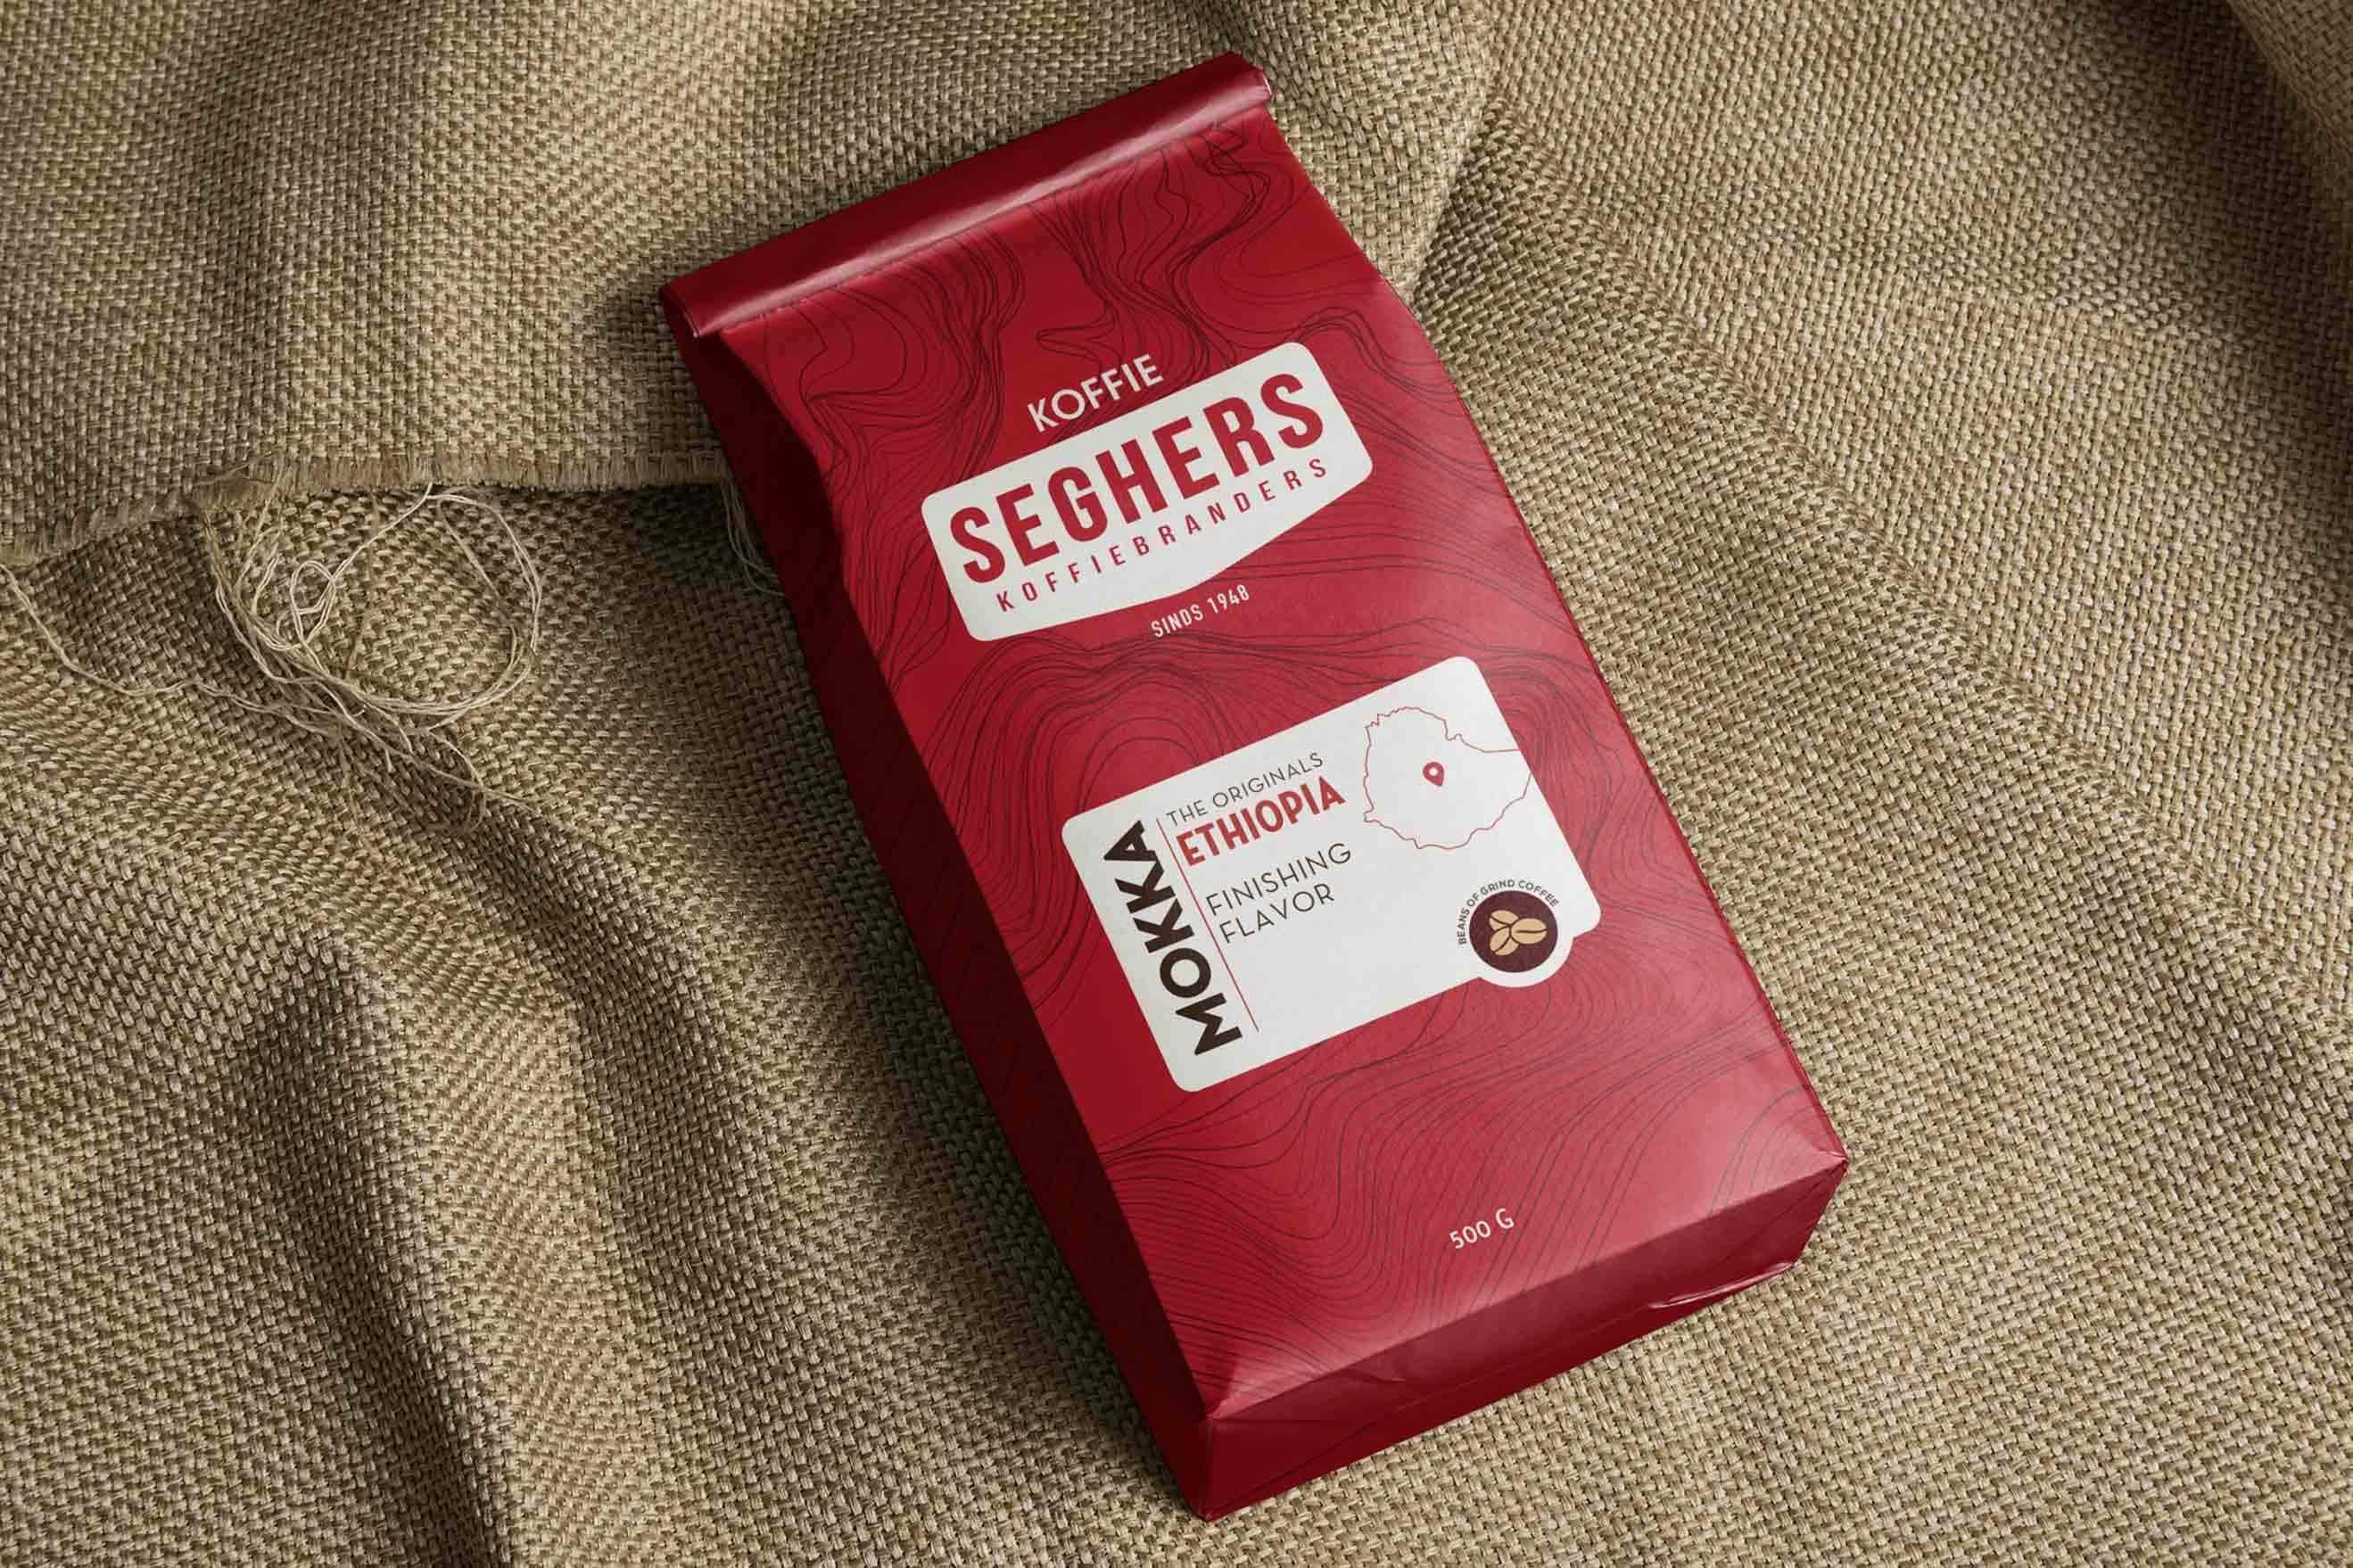 BDDB Seghers mock-up verpakking